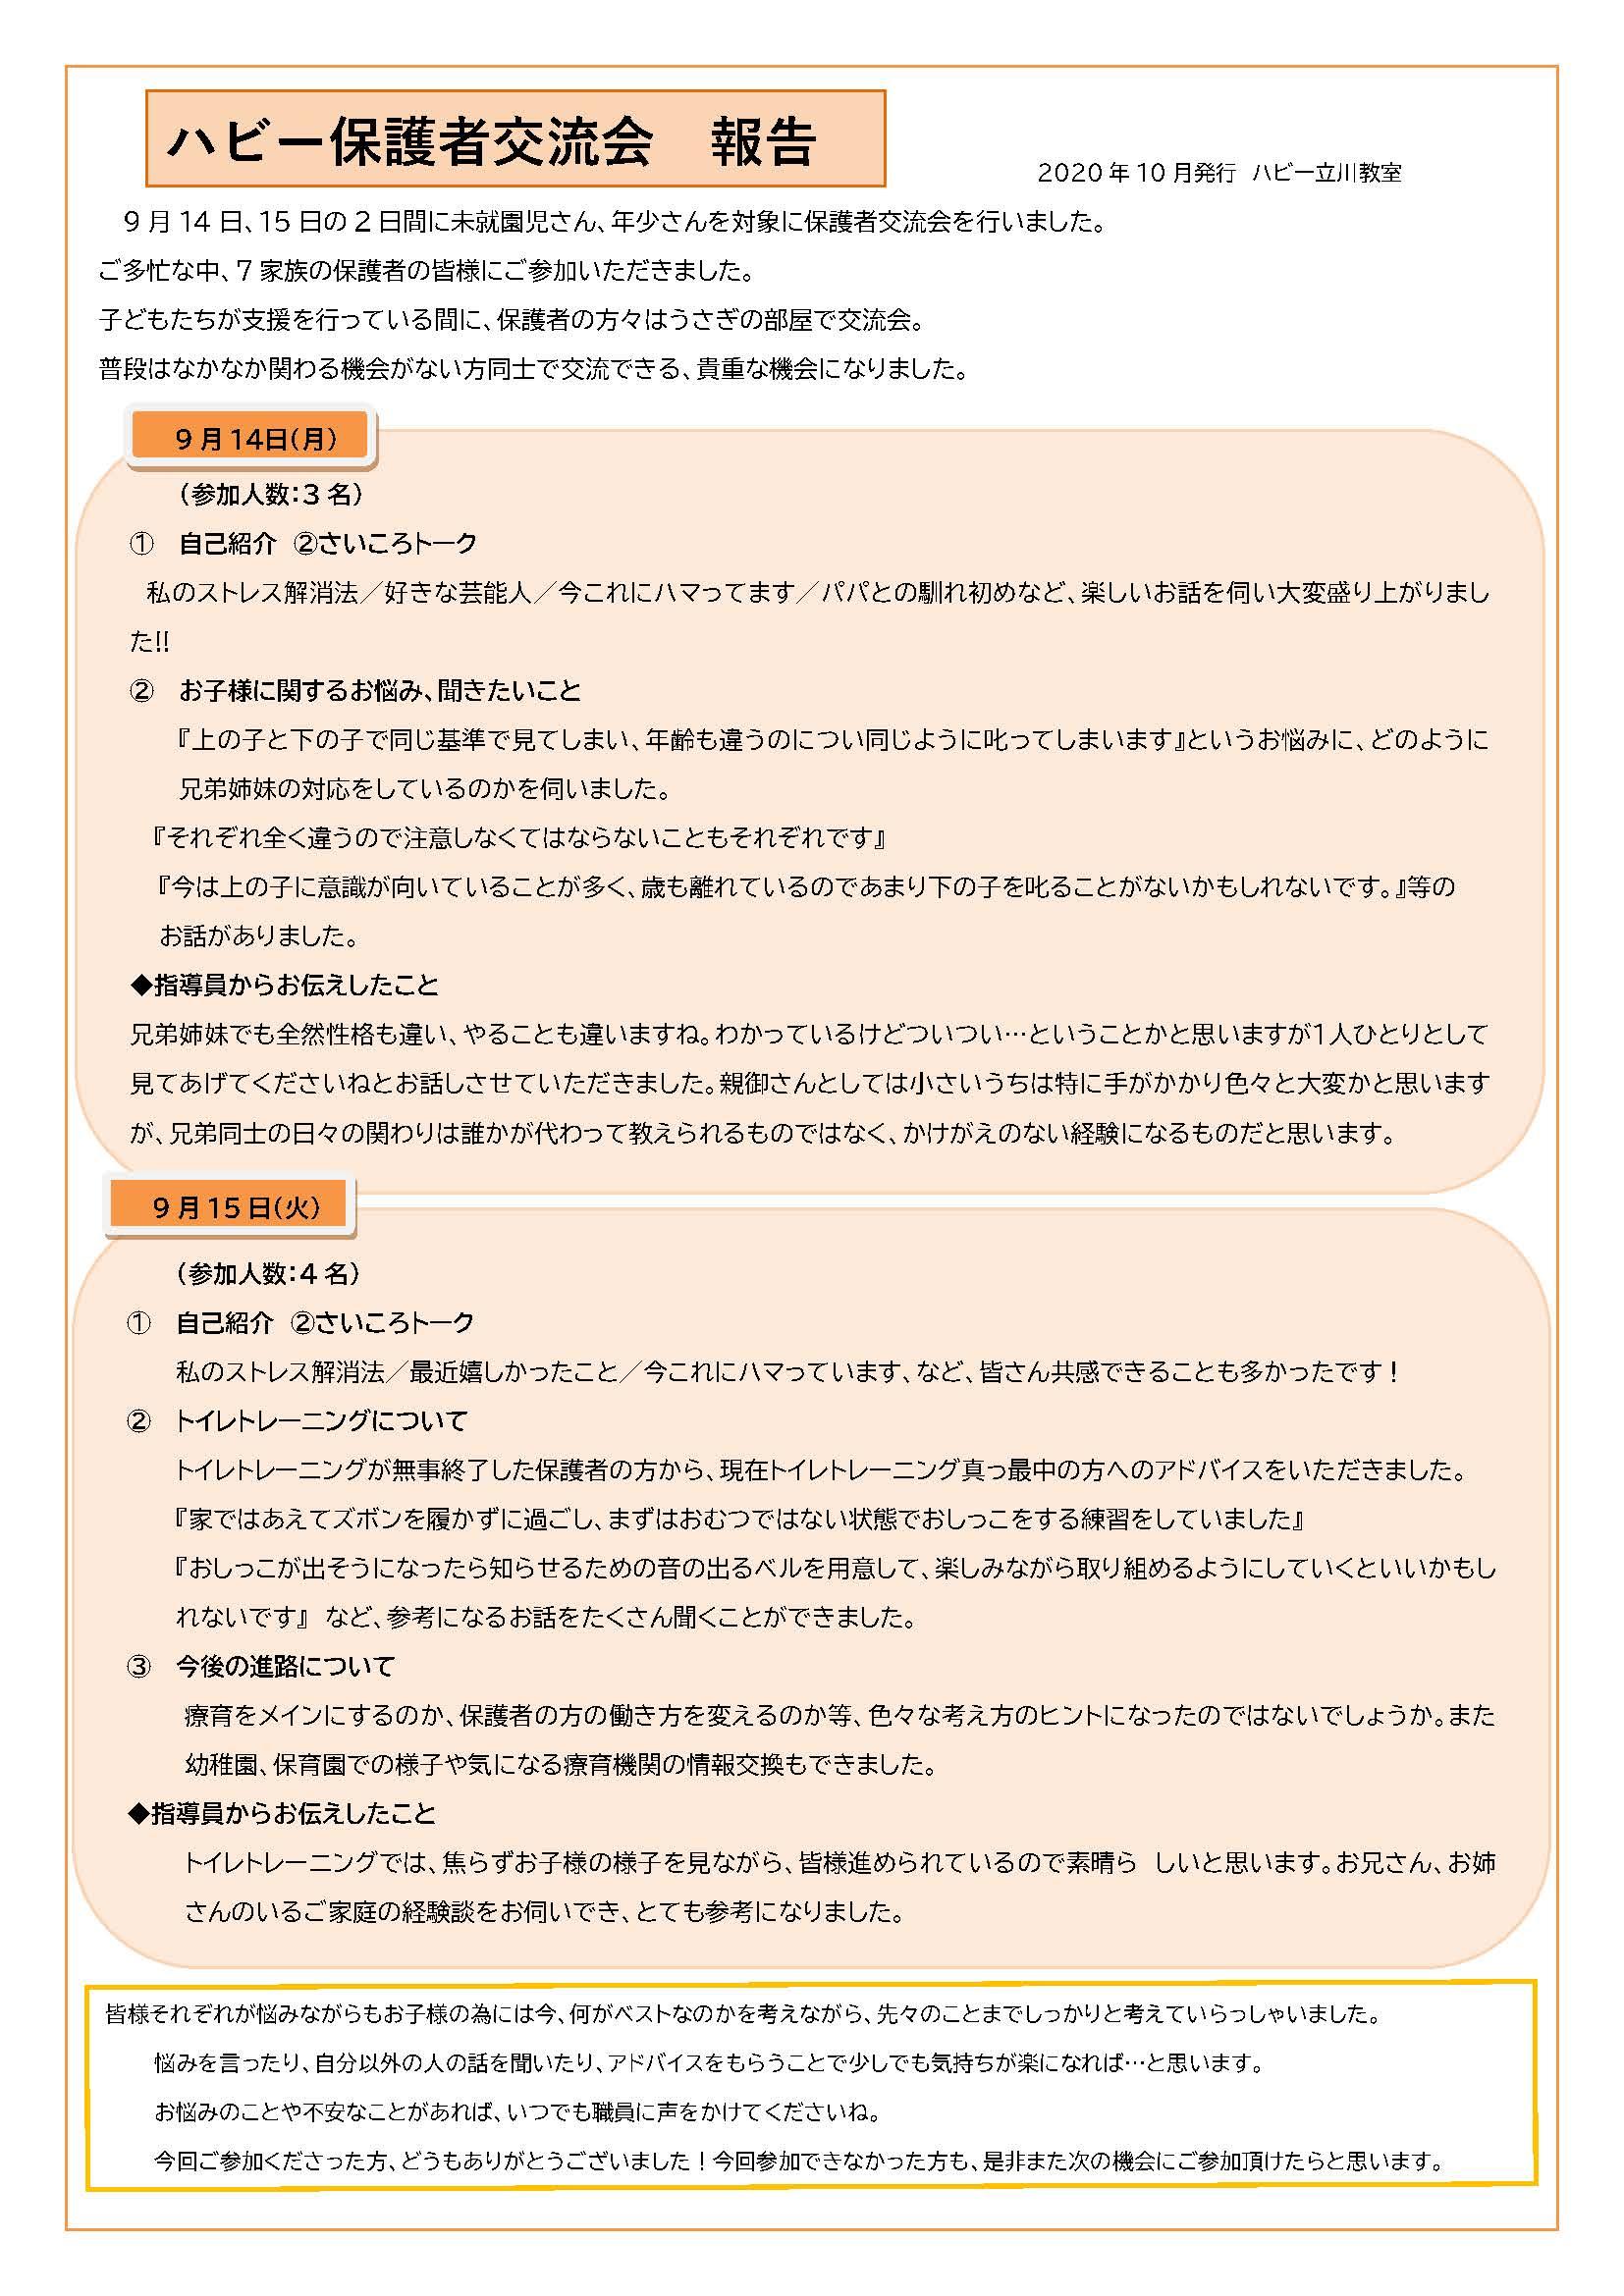 【立川】ハビー保護者交流会 報告